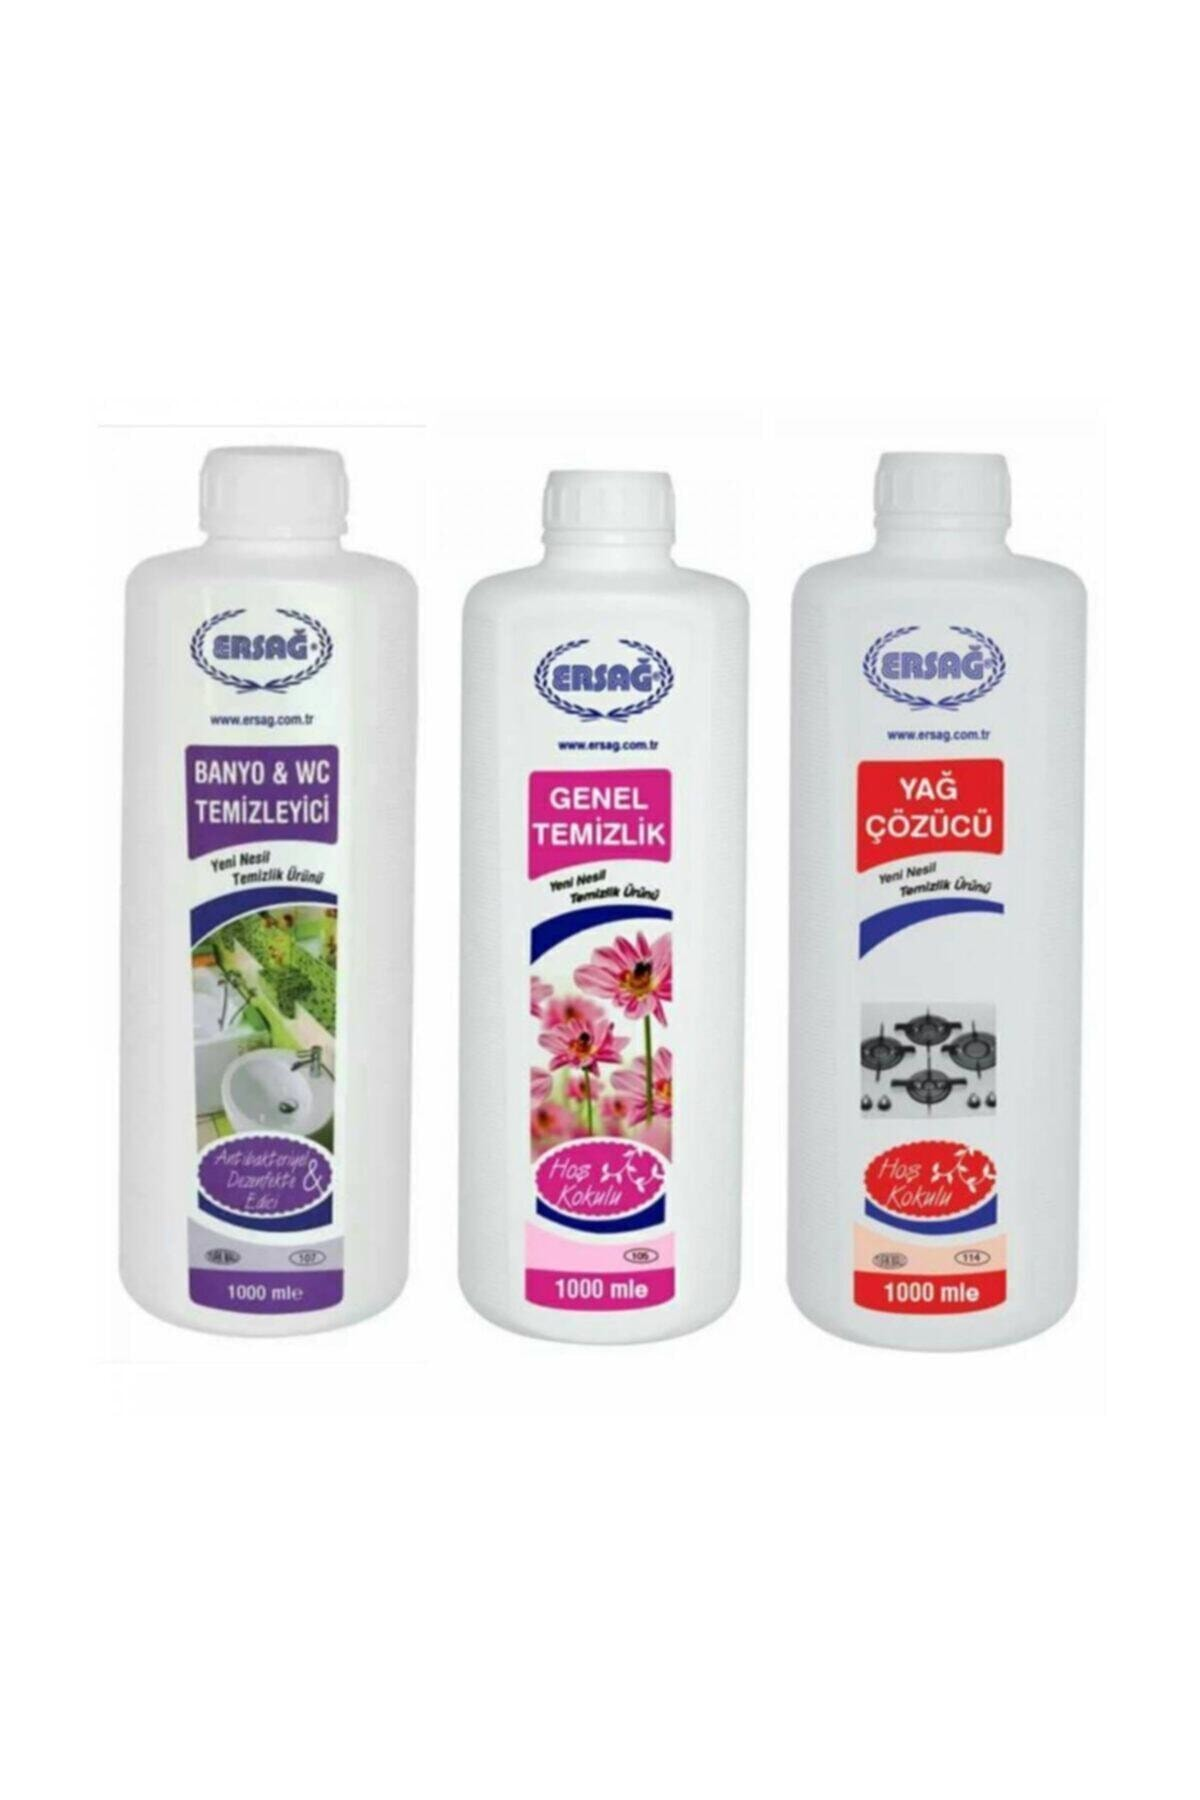 Ersağ Genel Temizlik + Antibakteriyel Banyo Wc+yağ Çöz 3'lü Set X 1000 ml 1